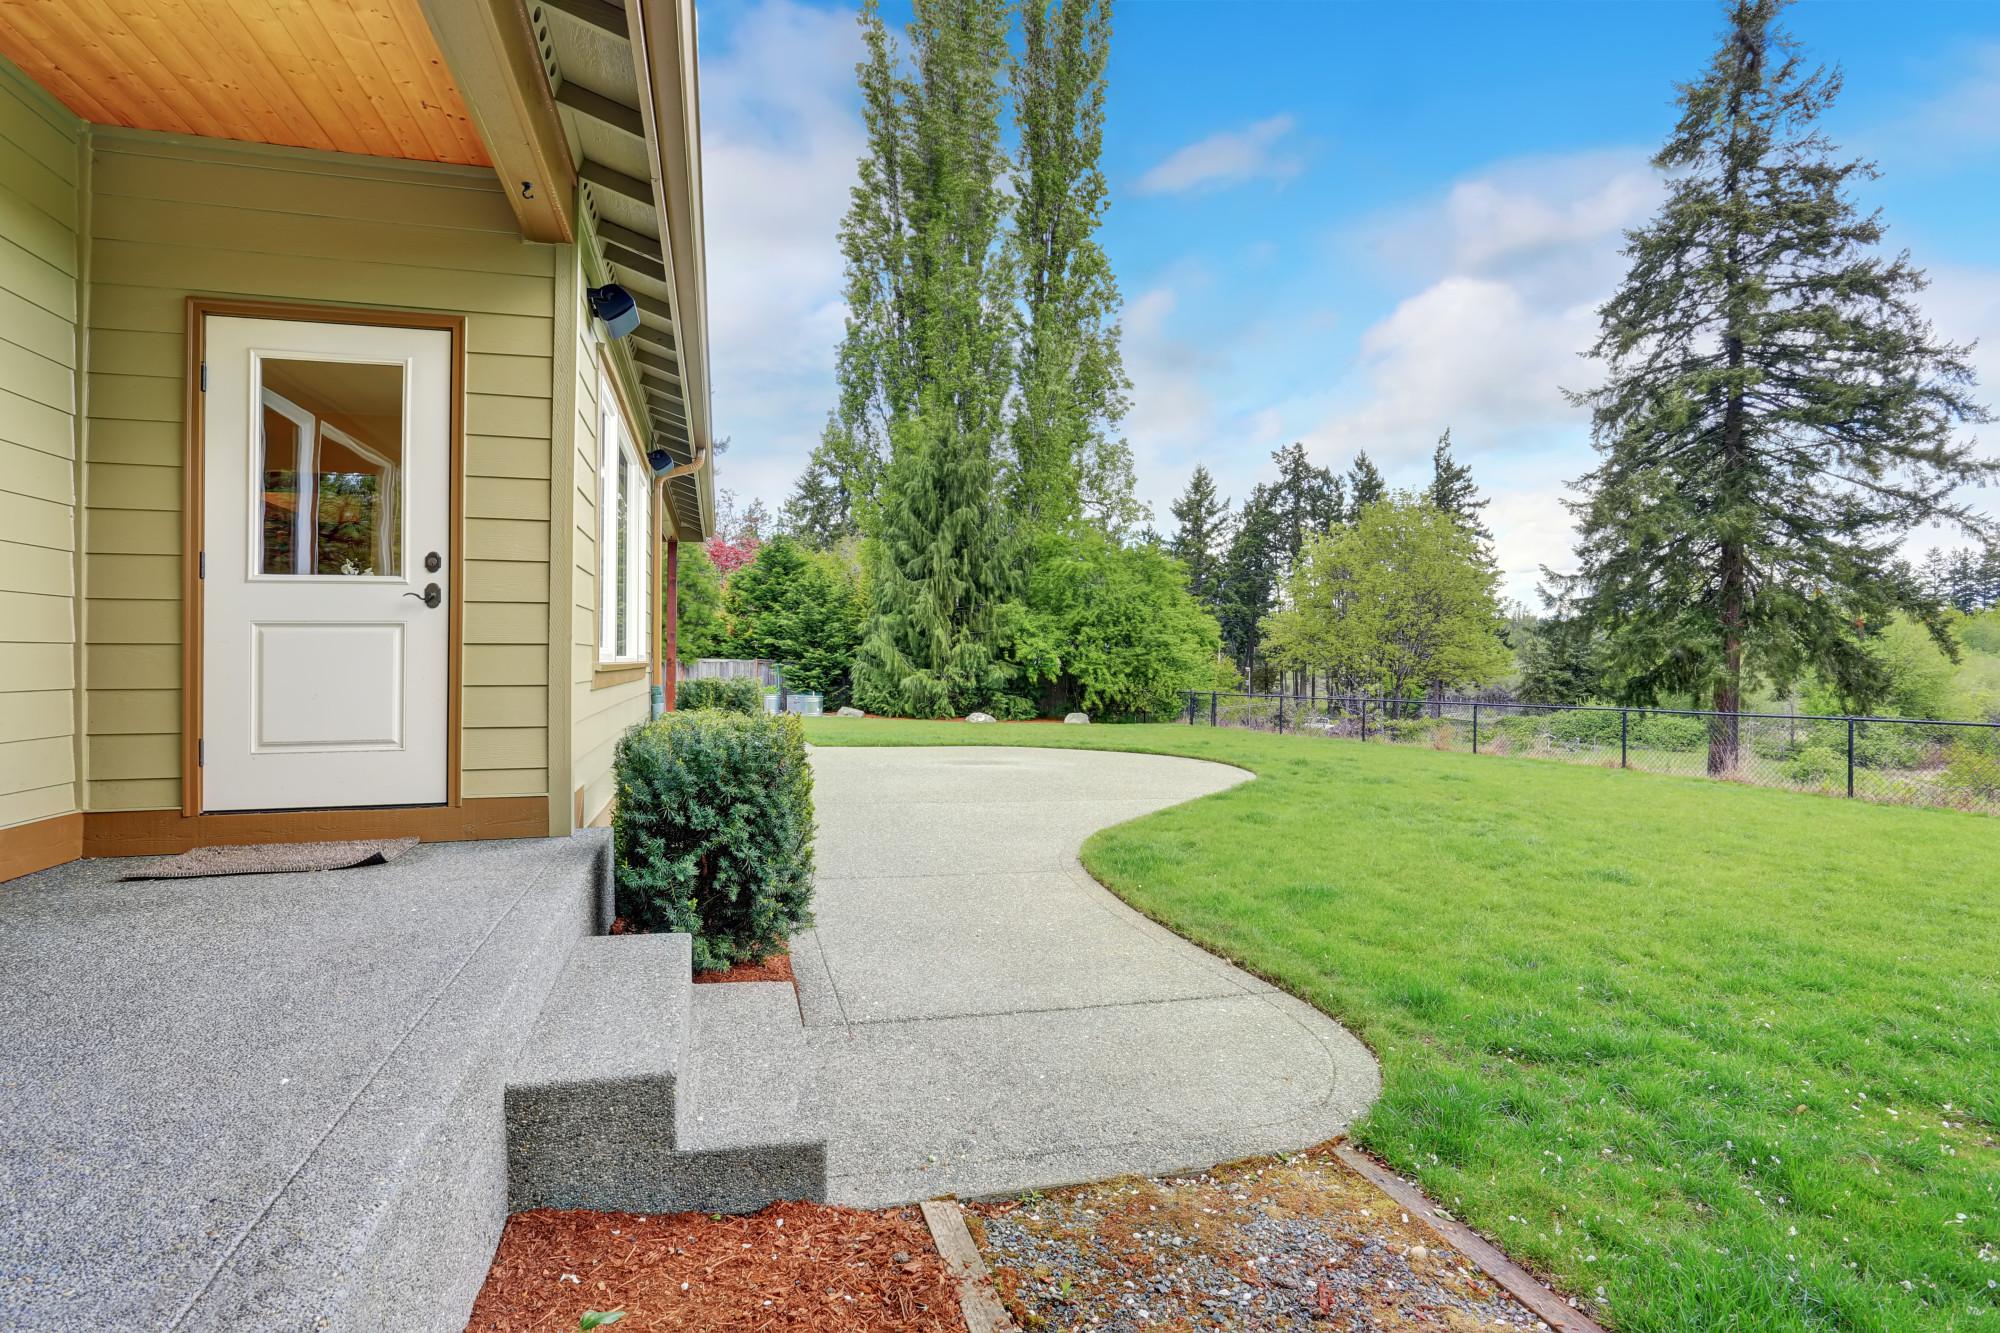 The Pros and Cons of a Concrete vs Asphalt Driveway